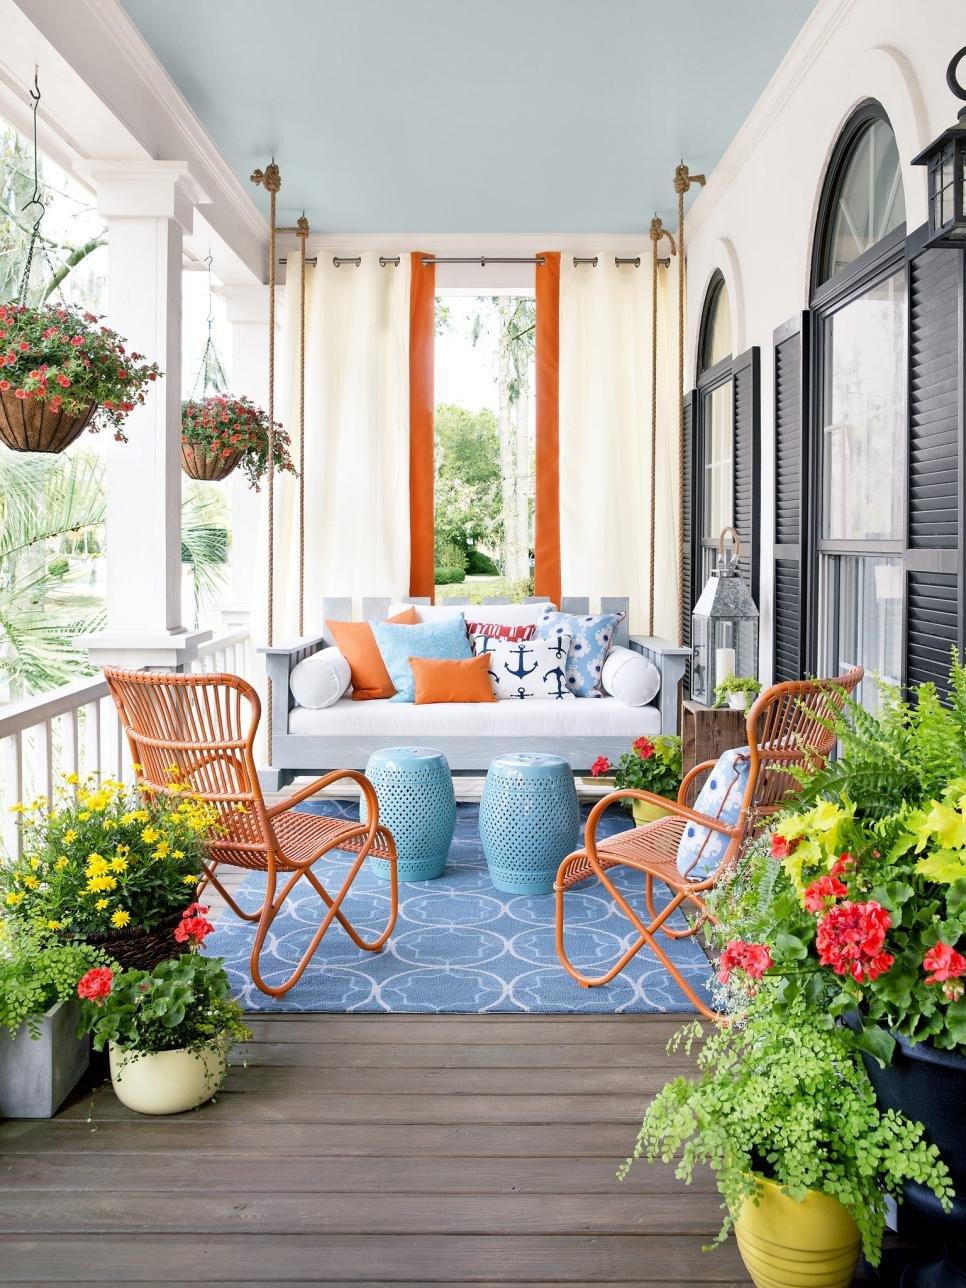 Decor Ideas for Front Porch Fresh Porch Design and Decorating Ideas